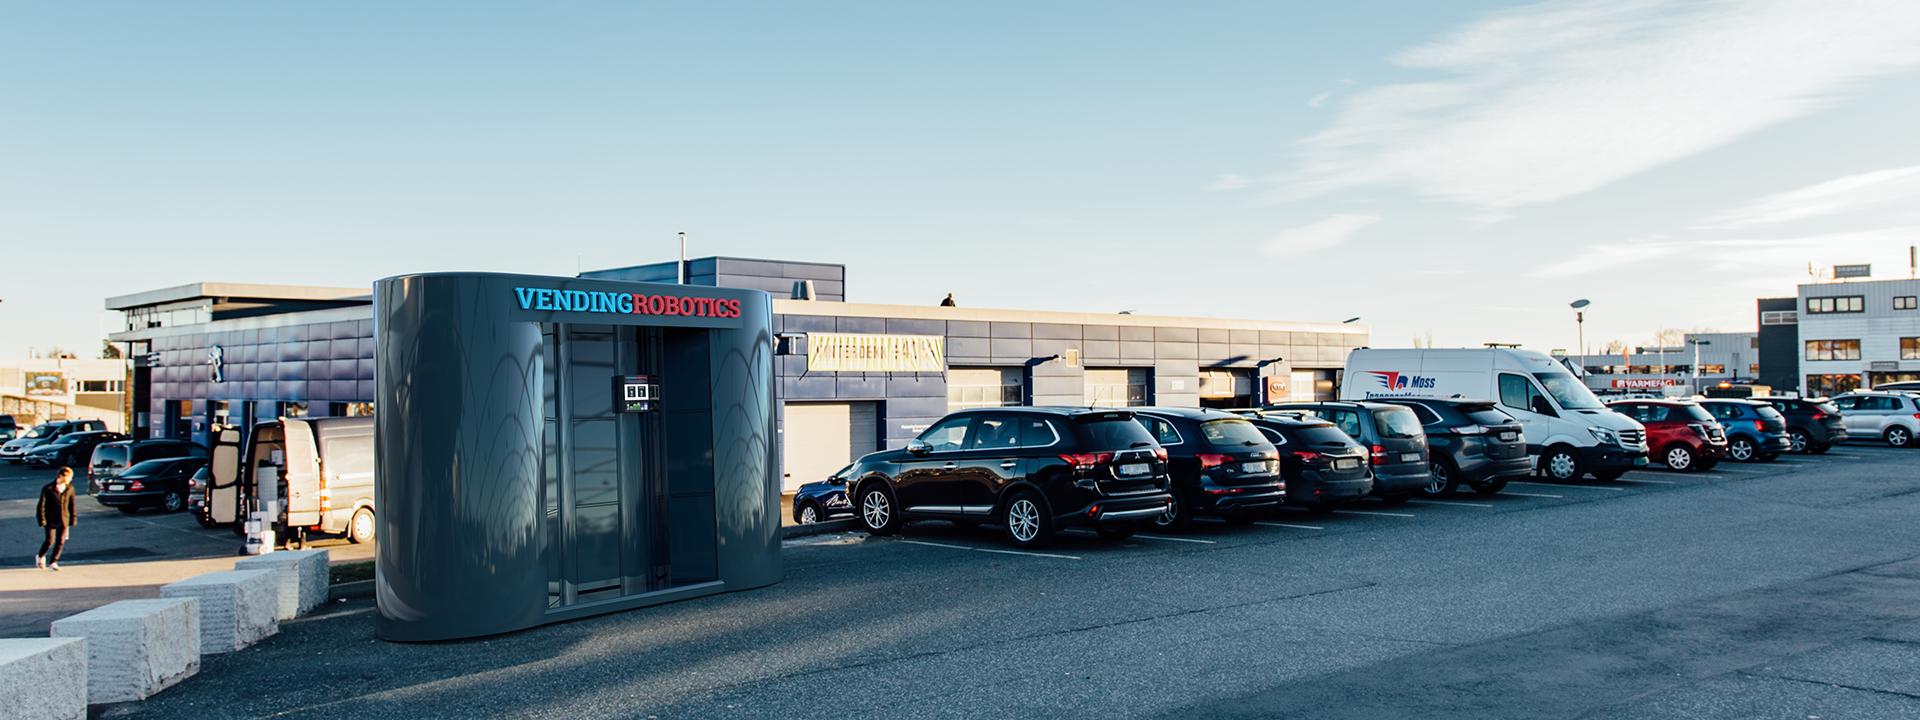 Gas Automat 16_6.png